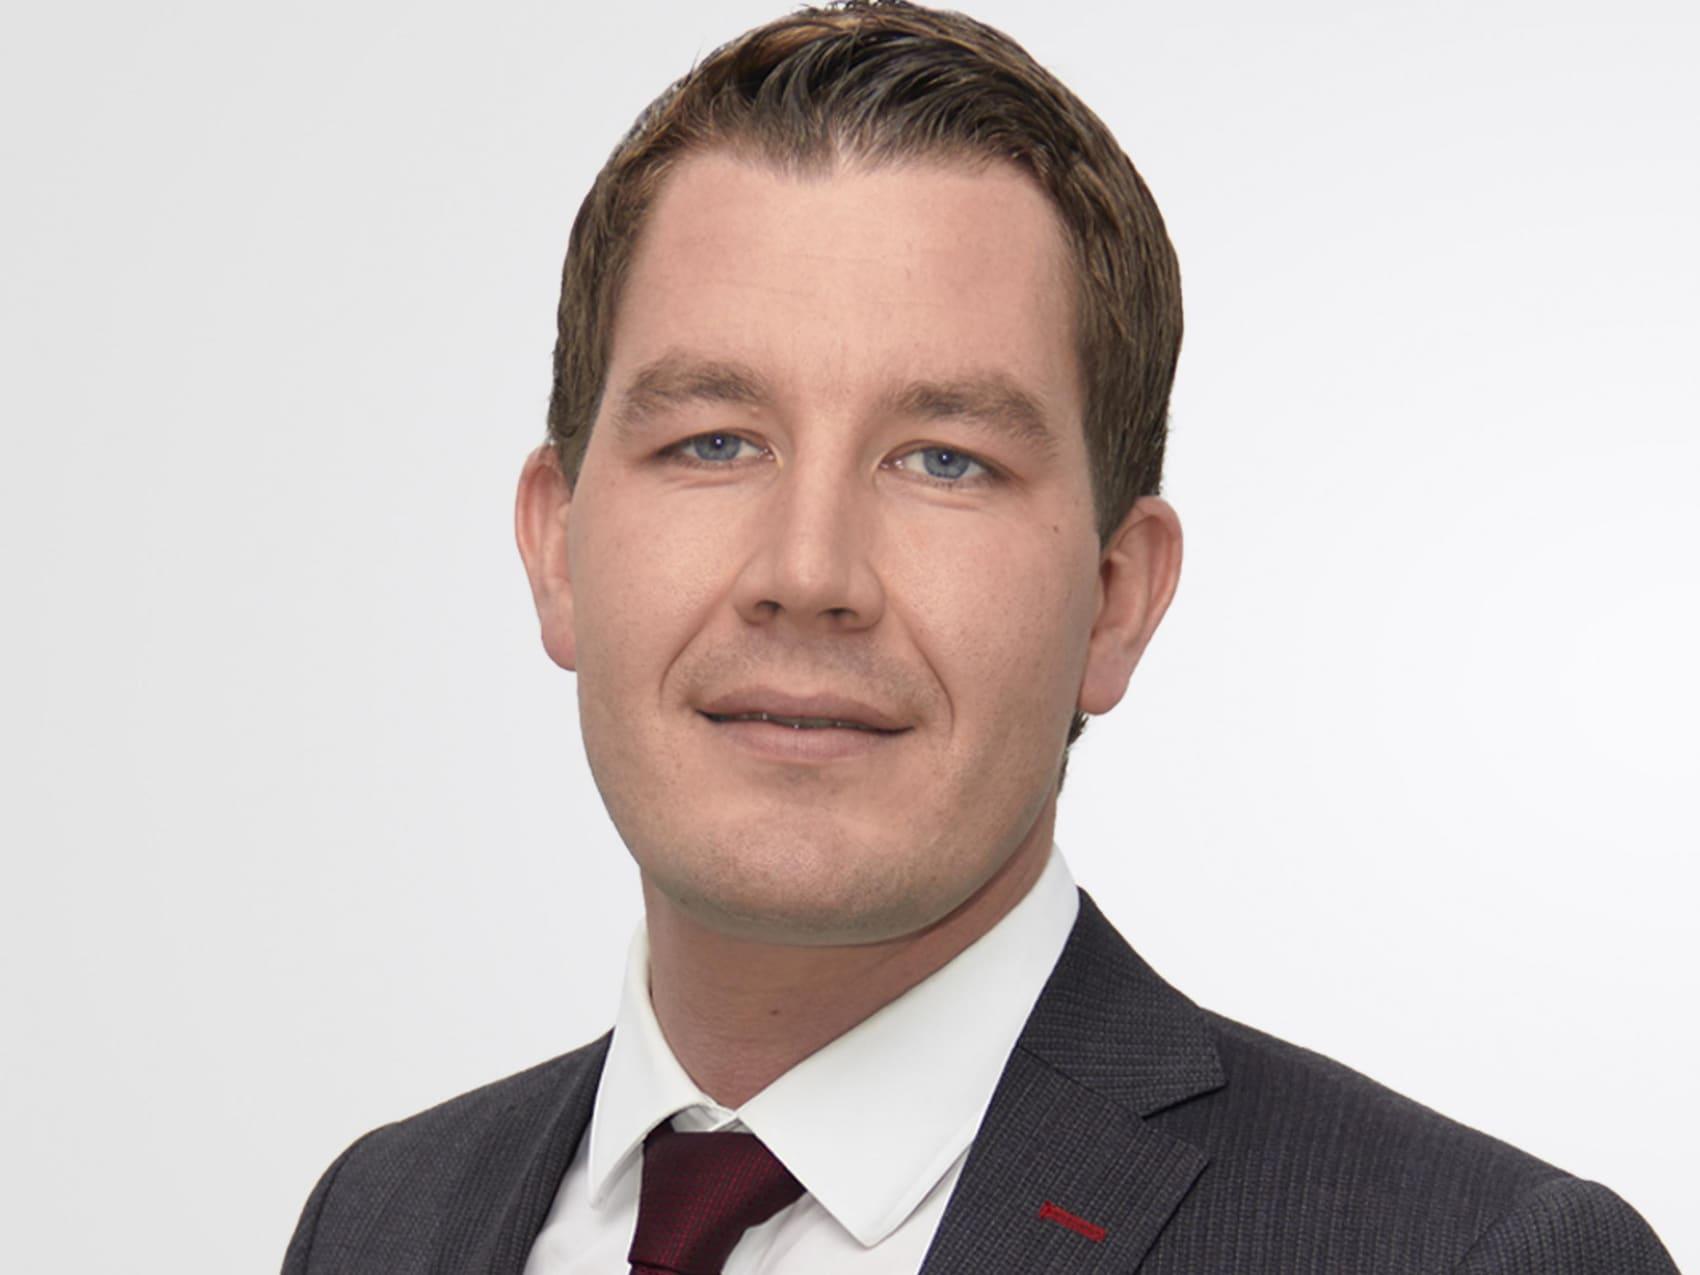 Jan Pollmann